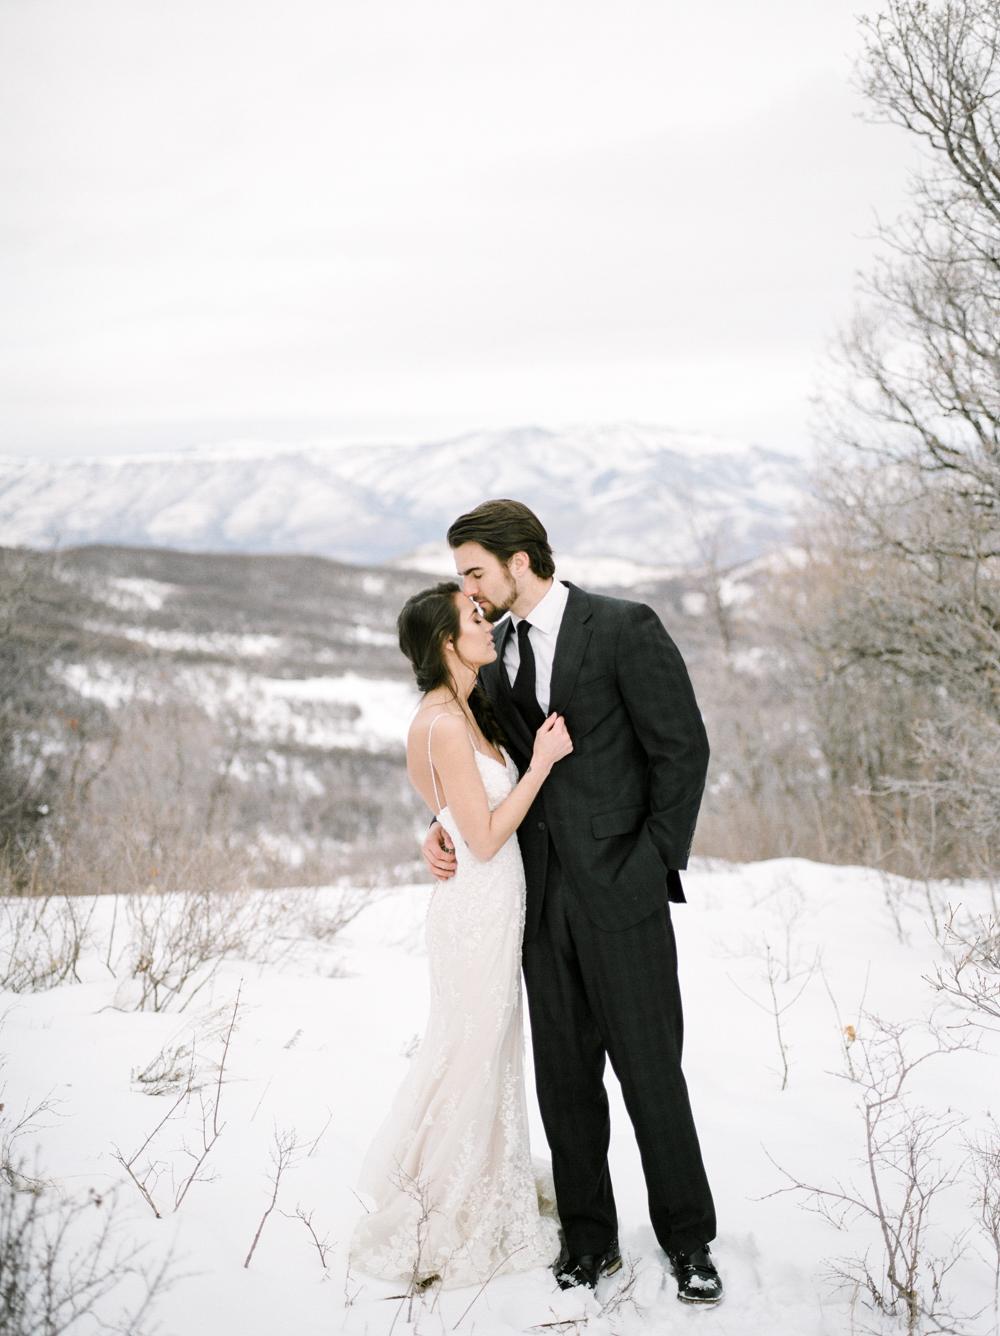 Christine-Gosch-Utah-film-photographer-wedding-mountains-snow-snowy-destination-7.jpg